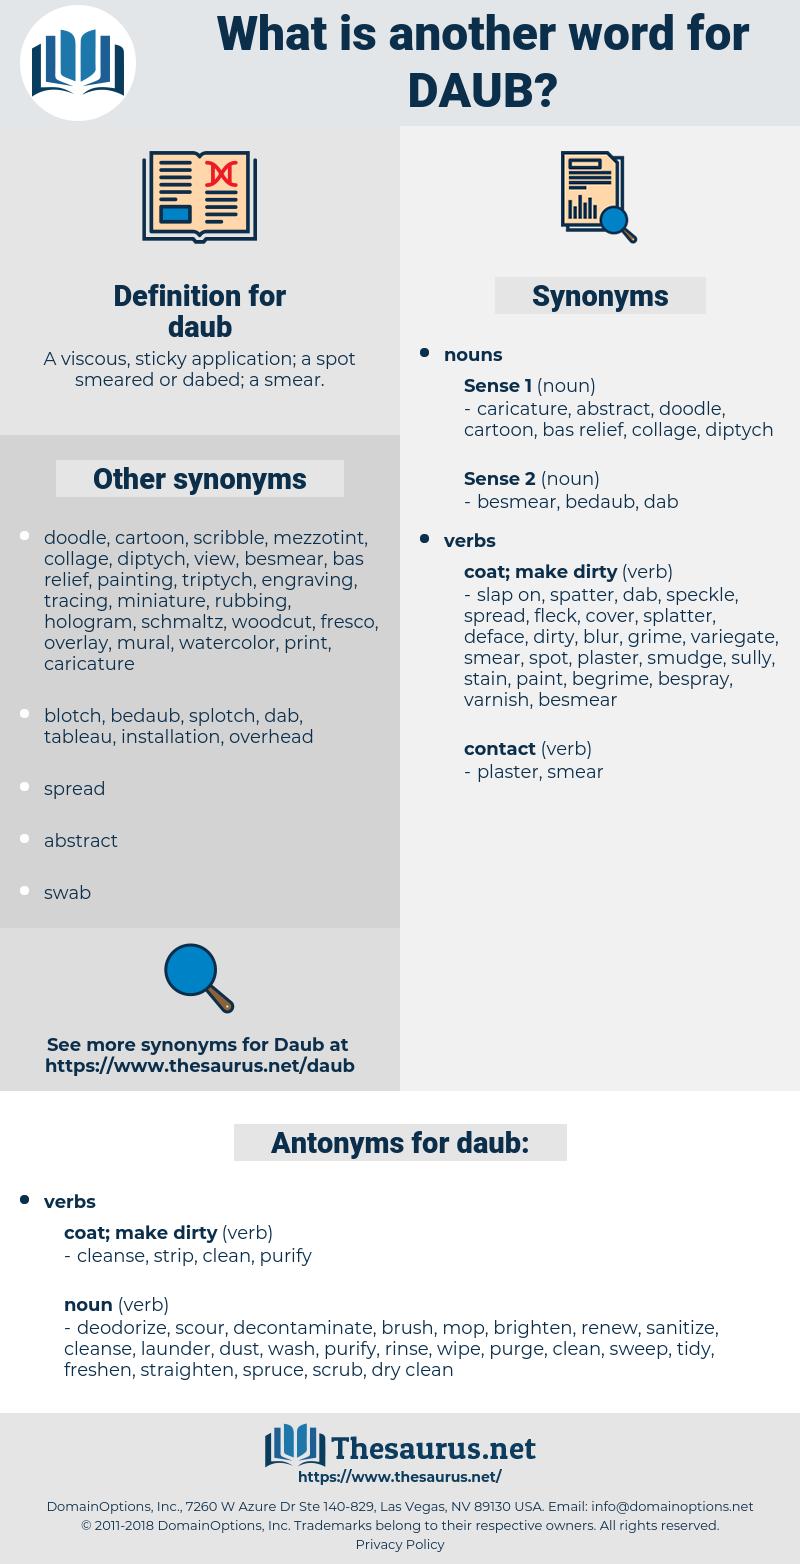 daub, synonym daub, another word for daub, words like daub, thesaurus daub